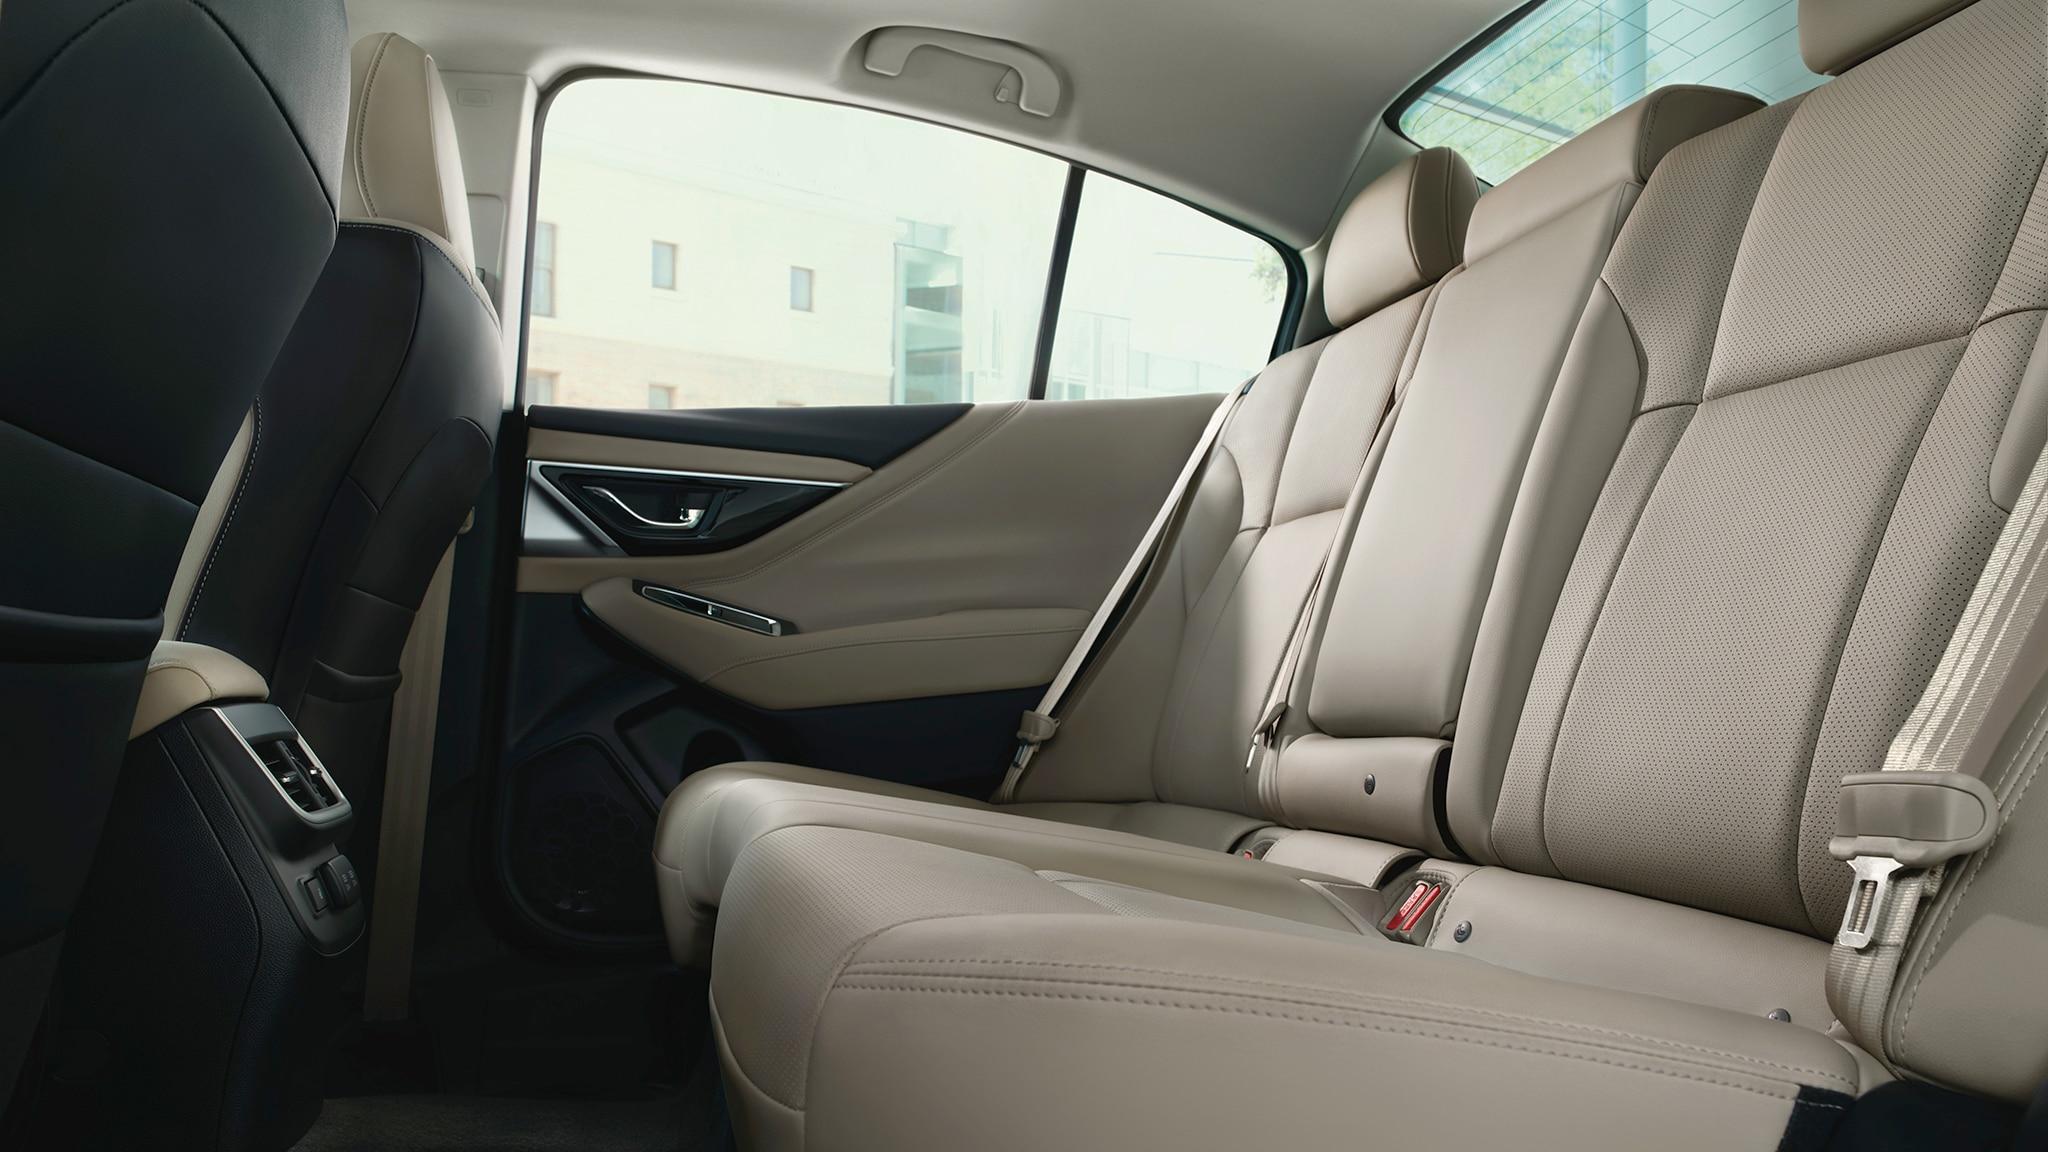 2020 Subaru Legacy Photos And Info New Platform And New